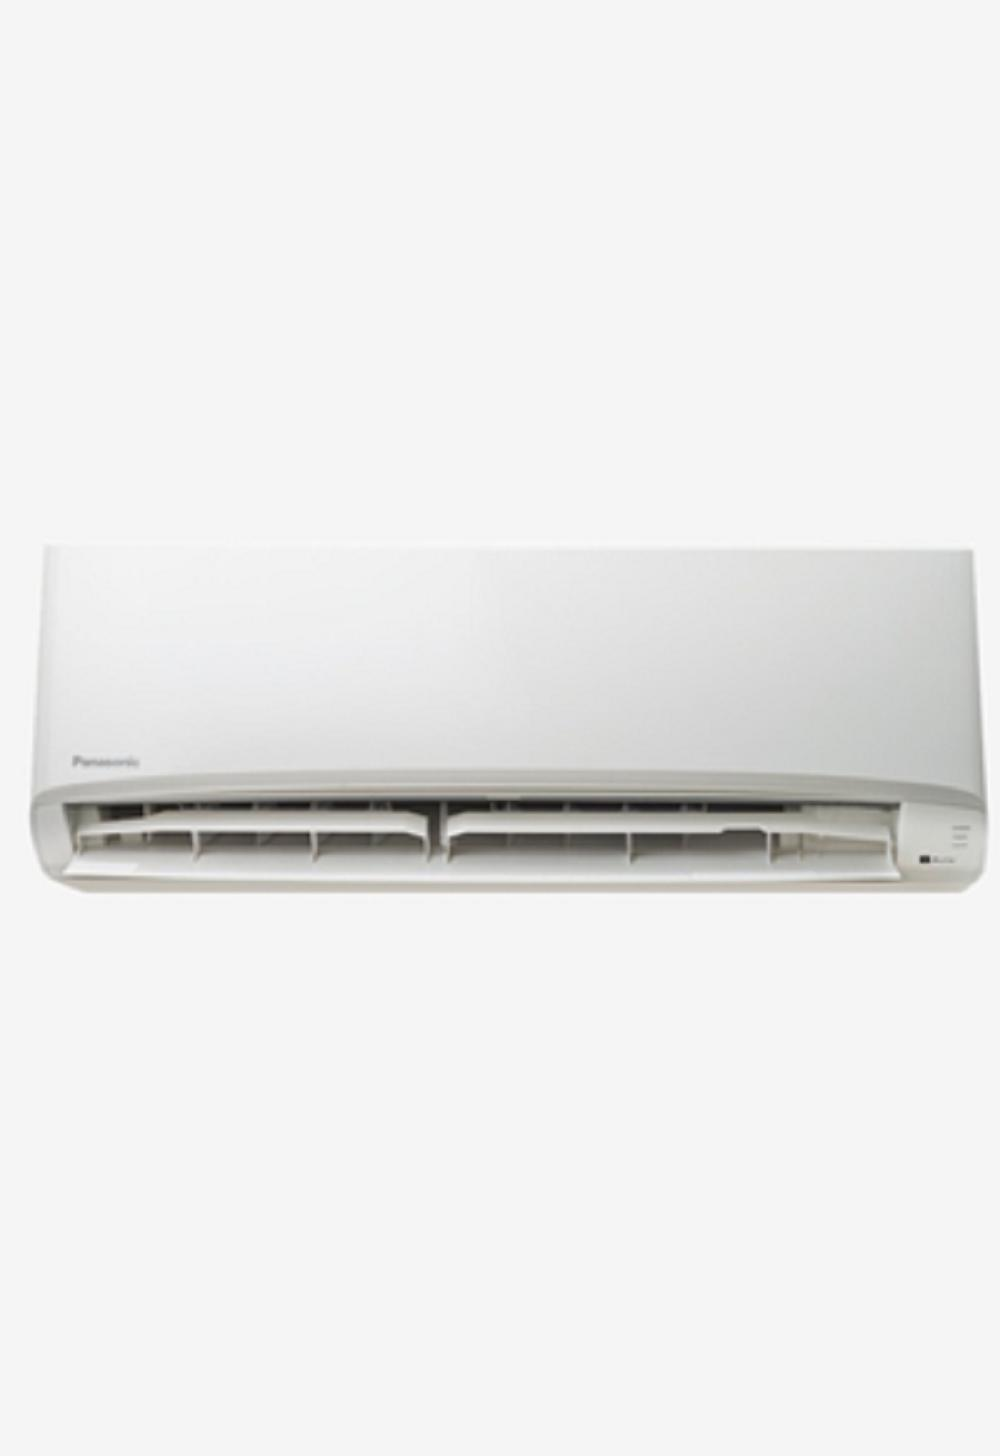 Panasonic AC Split 1pk CS-YN9TKJ Termasuk Pasang